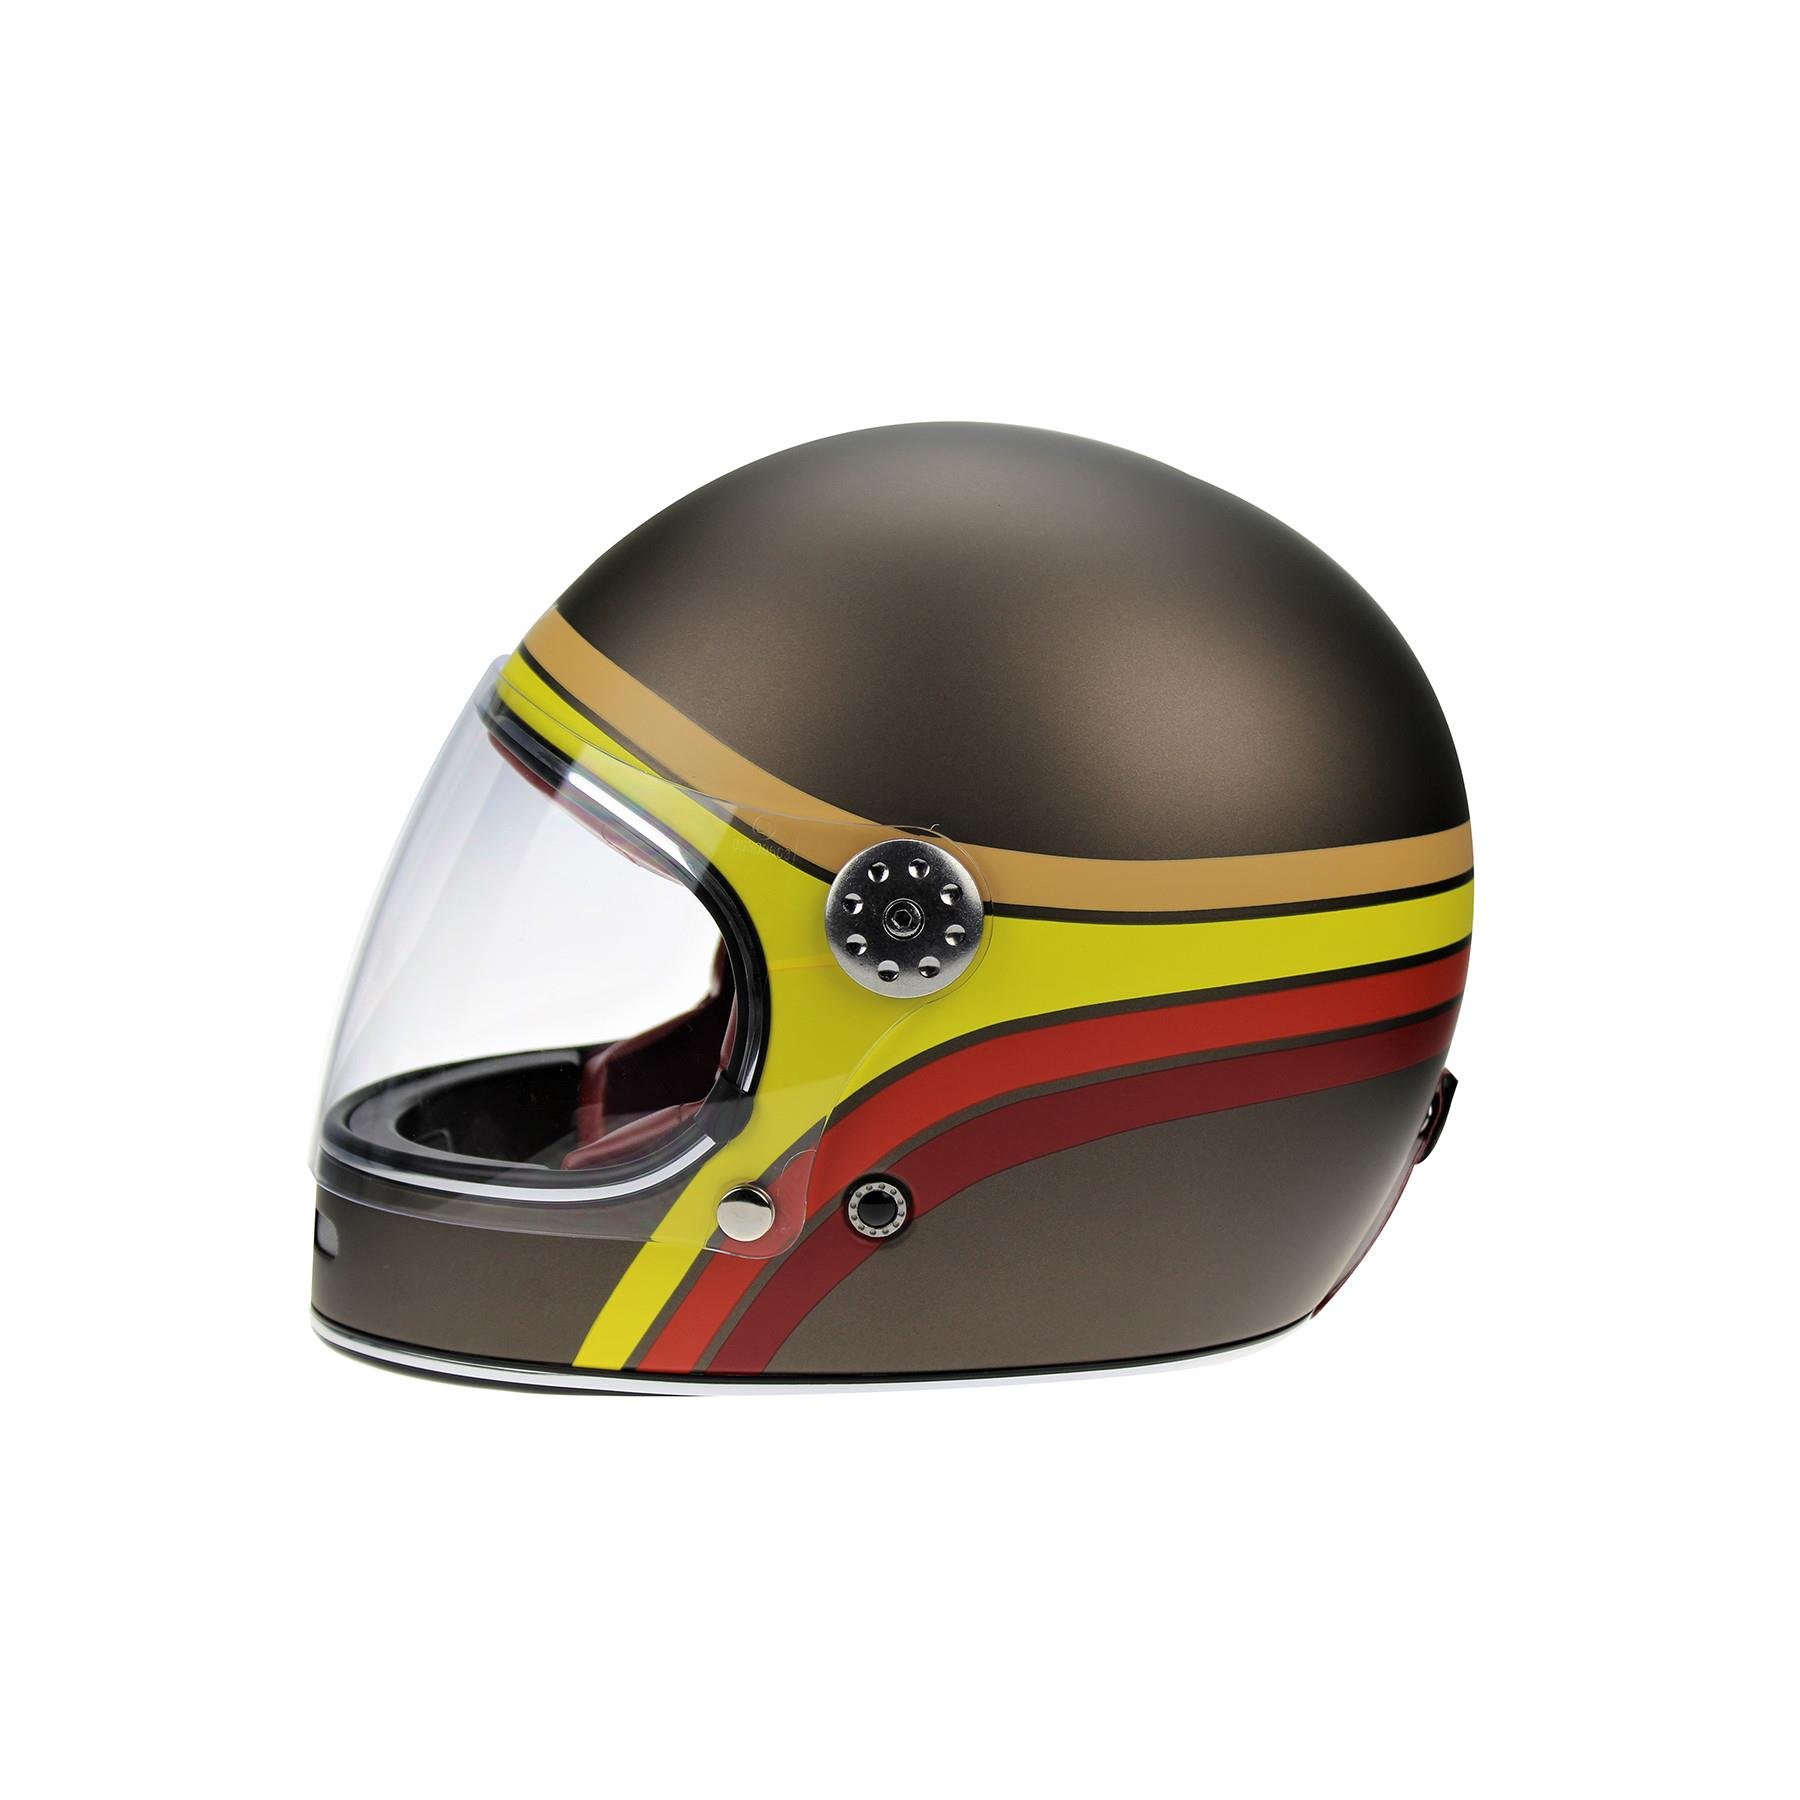 Viper-F656-Retro-Vintage-FibreGlass-Full-Face-Motorcycle-Bike-Road-Crash-Helmet miniature 29